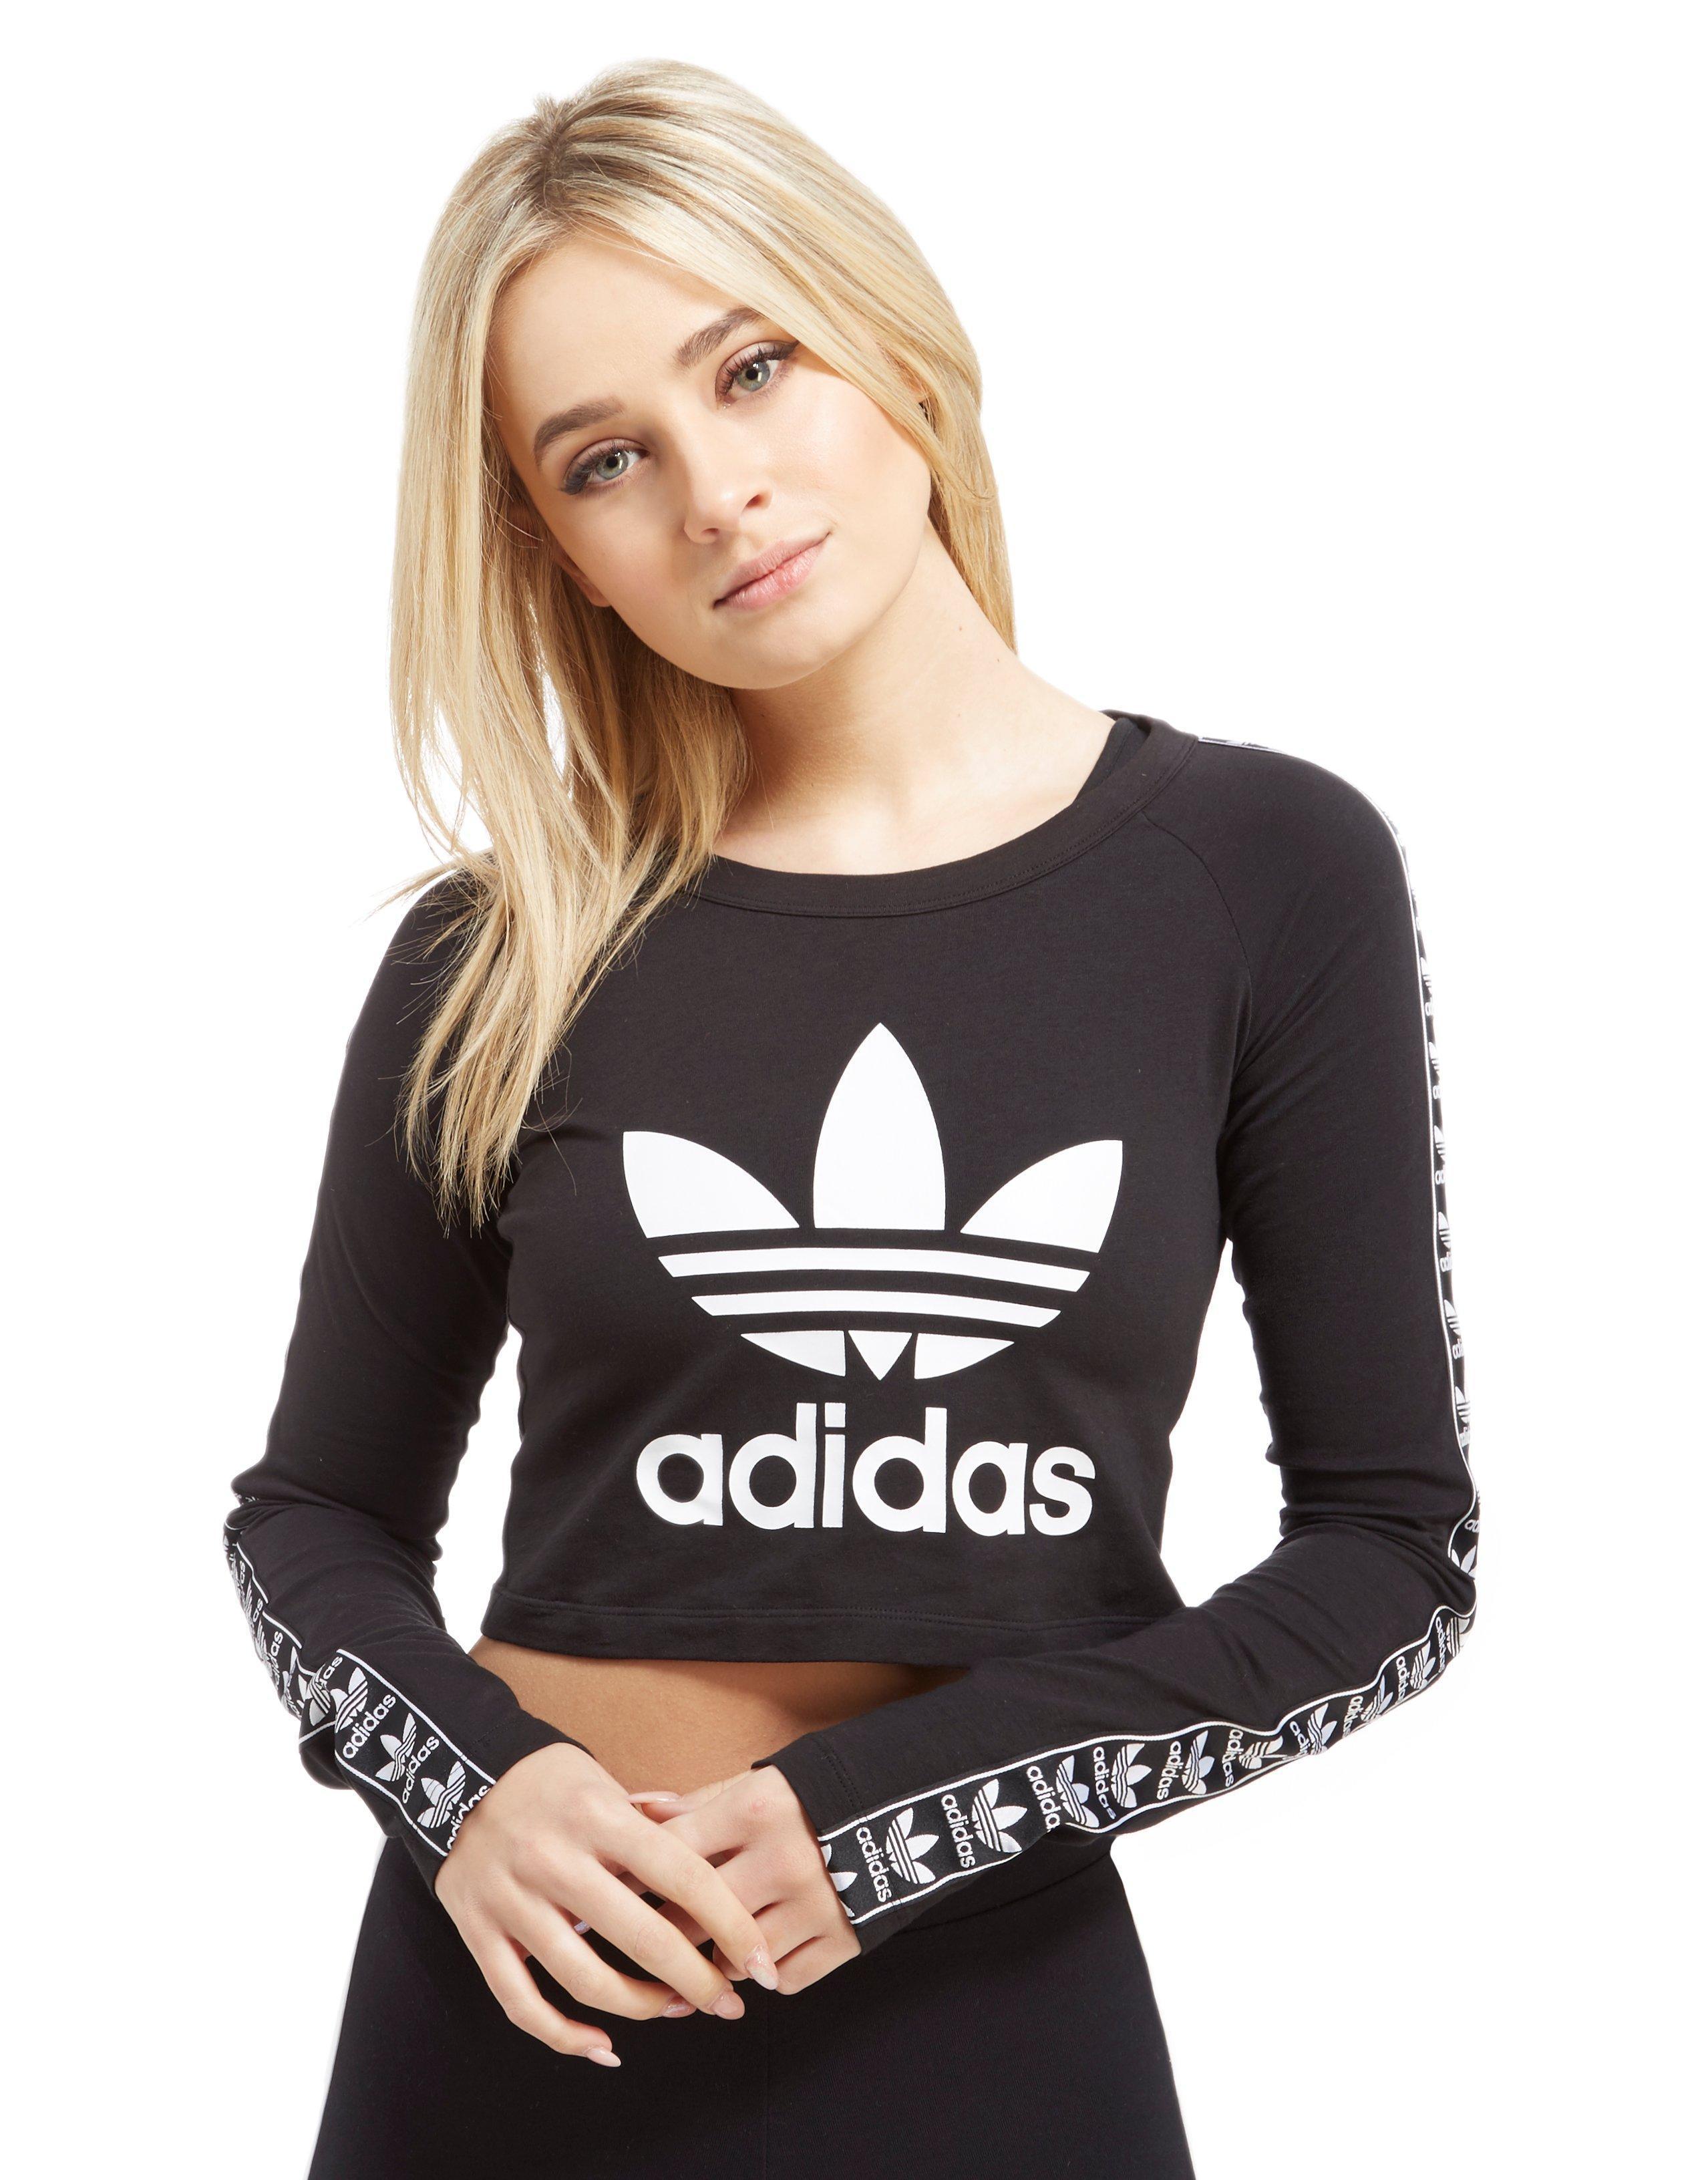 9b9a17d9d2c5 adidas Originals Tape Longsleeve Crop T-shirt in Black - Lyst